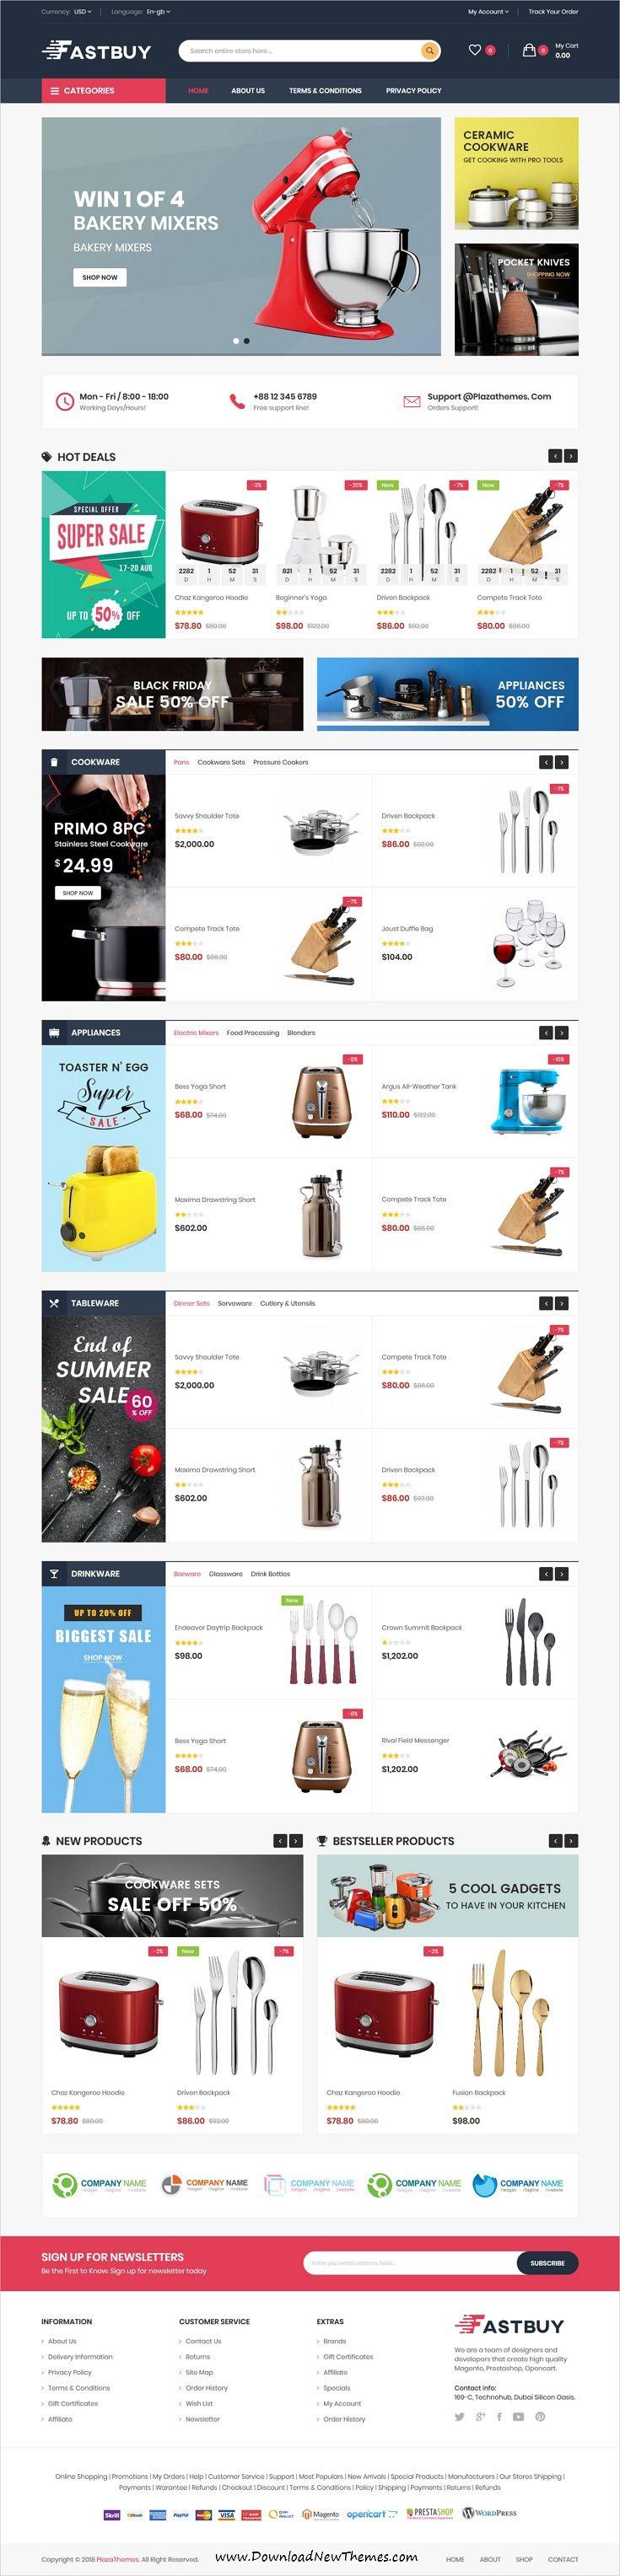 104 best shop images on Pinterest